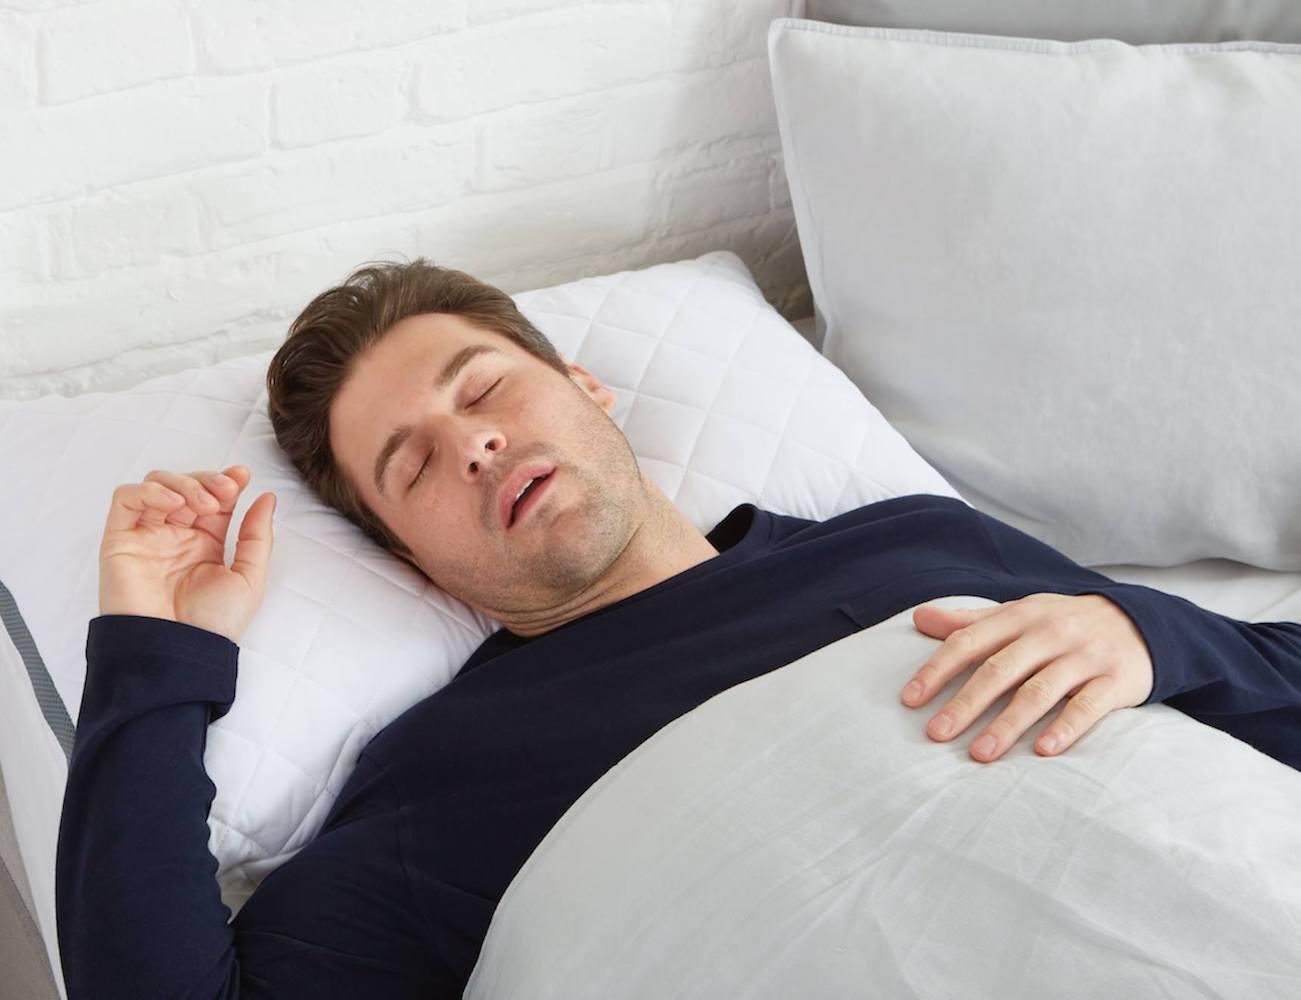 10 Sleep tech gadgets to help you get some shuteye - soundsleep 01